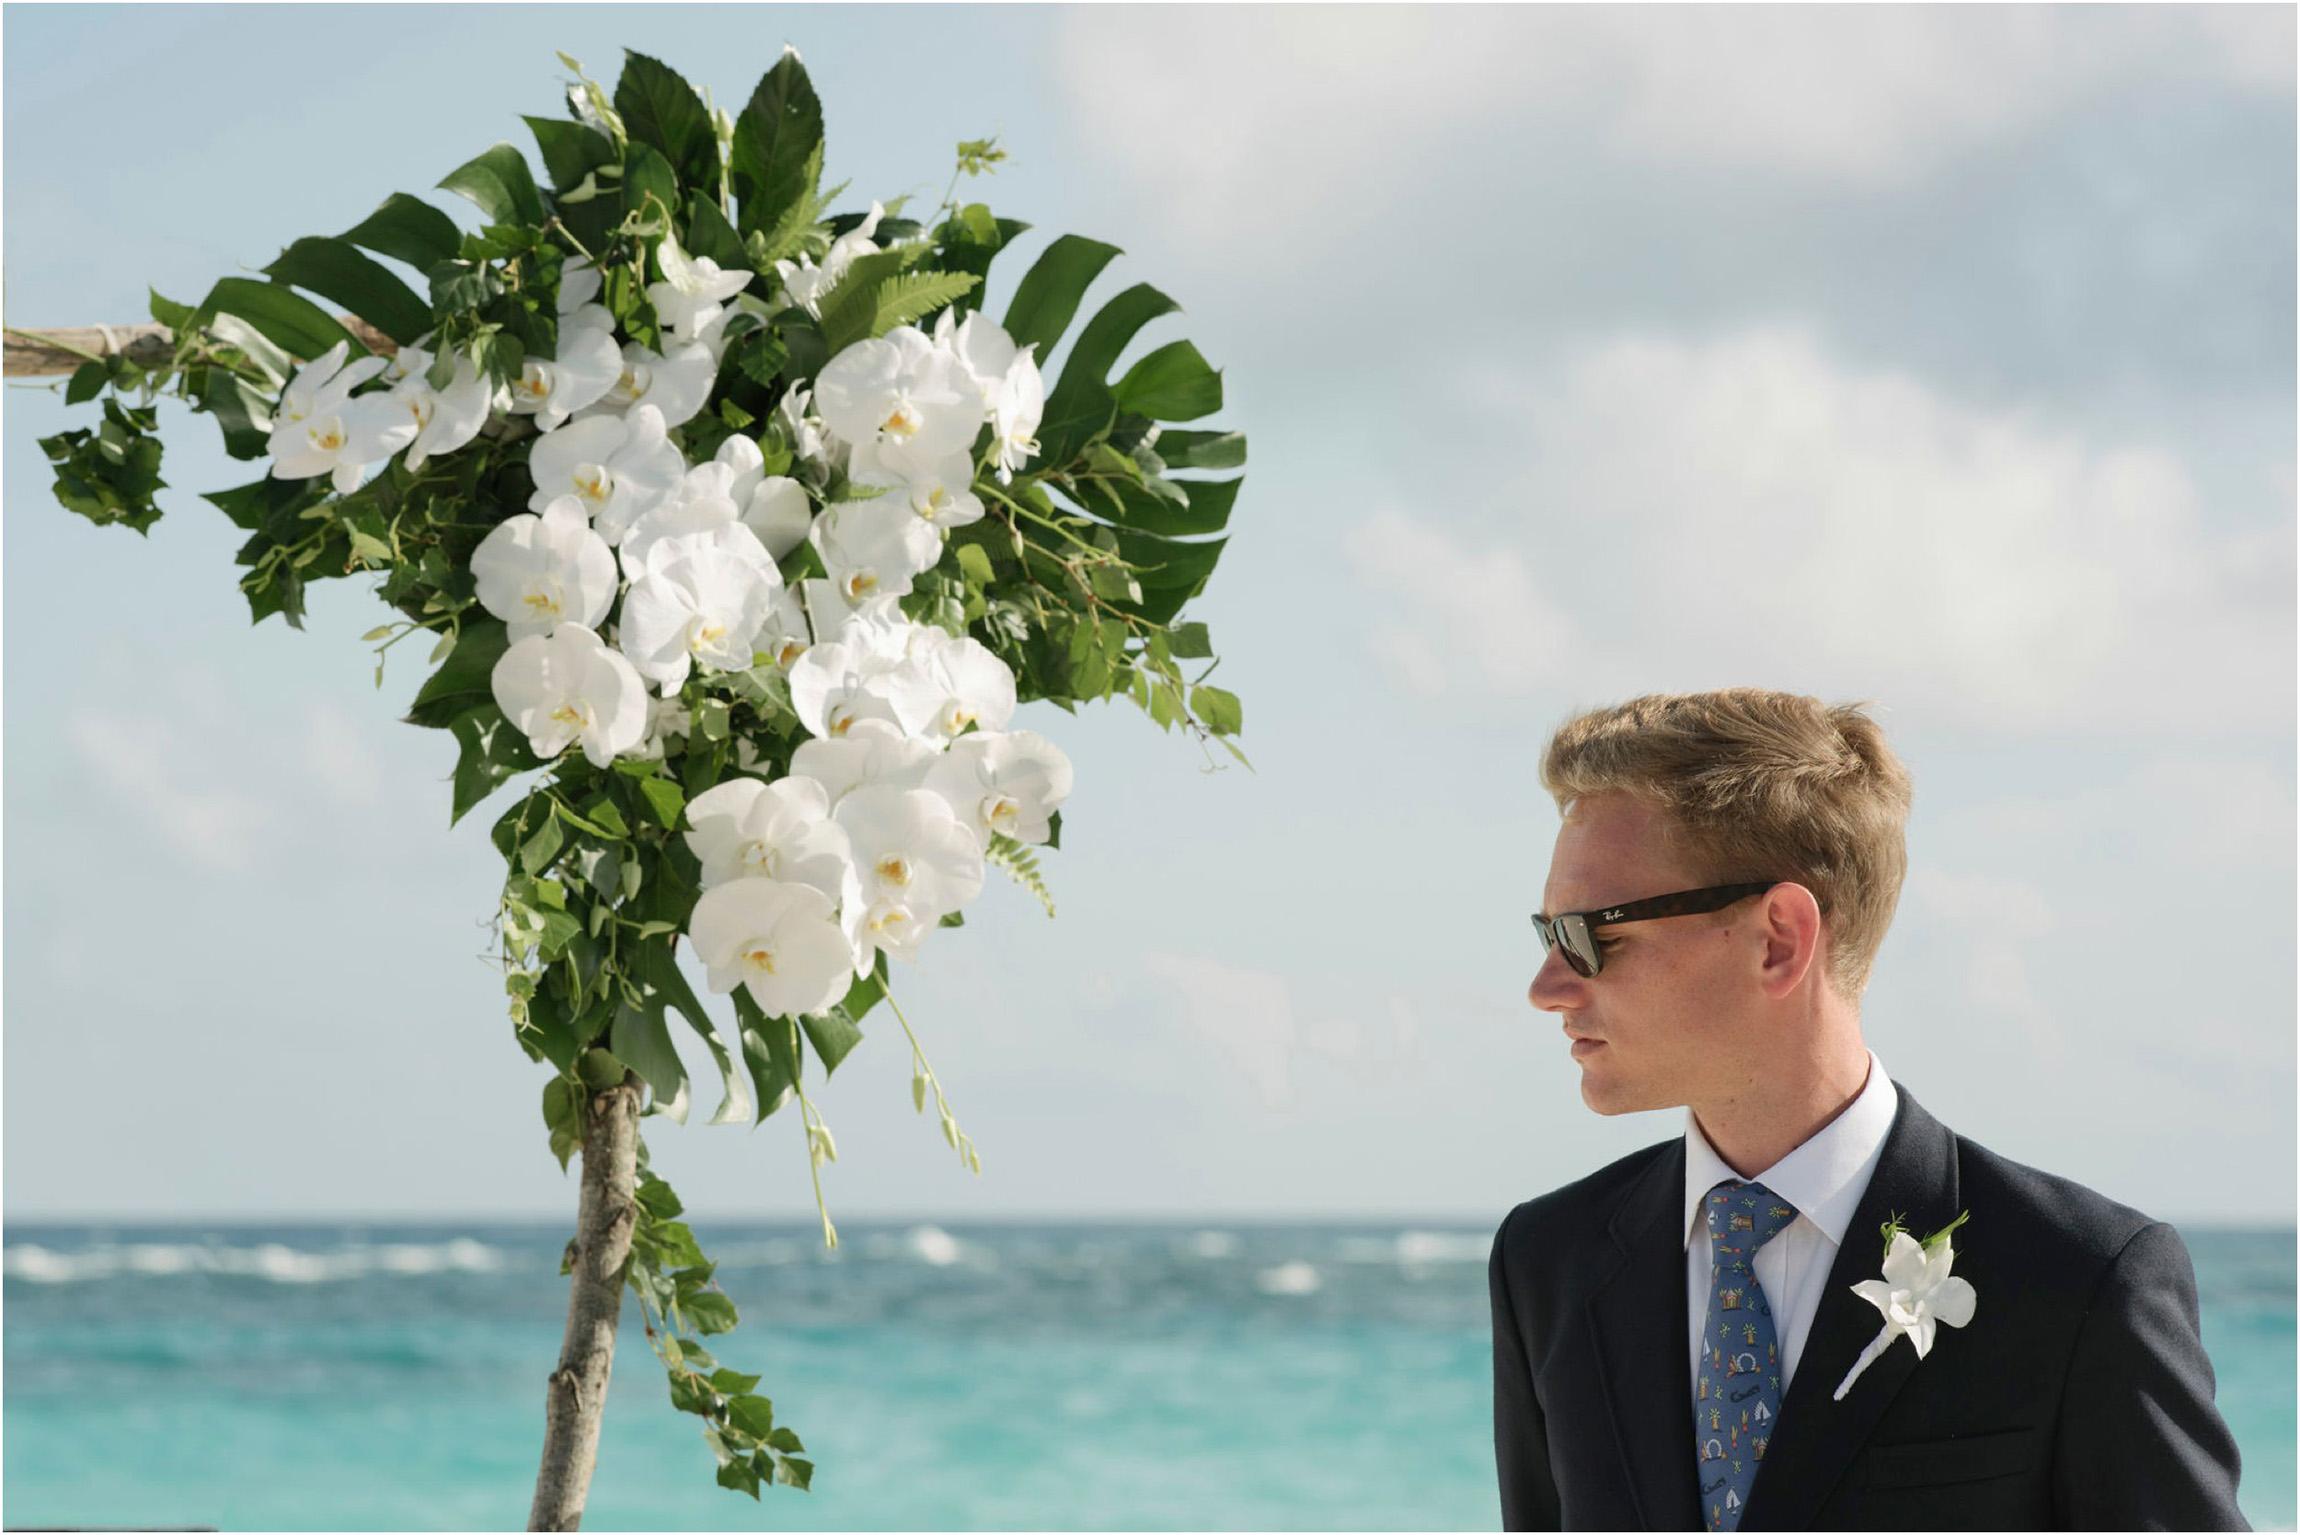 ©FianderFoto_Bermuda Wedding Photographer_Mid Ocean_Rachel_Angus_042.jpg